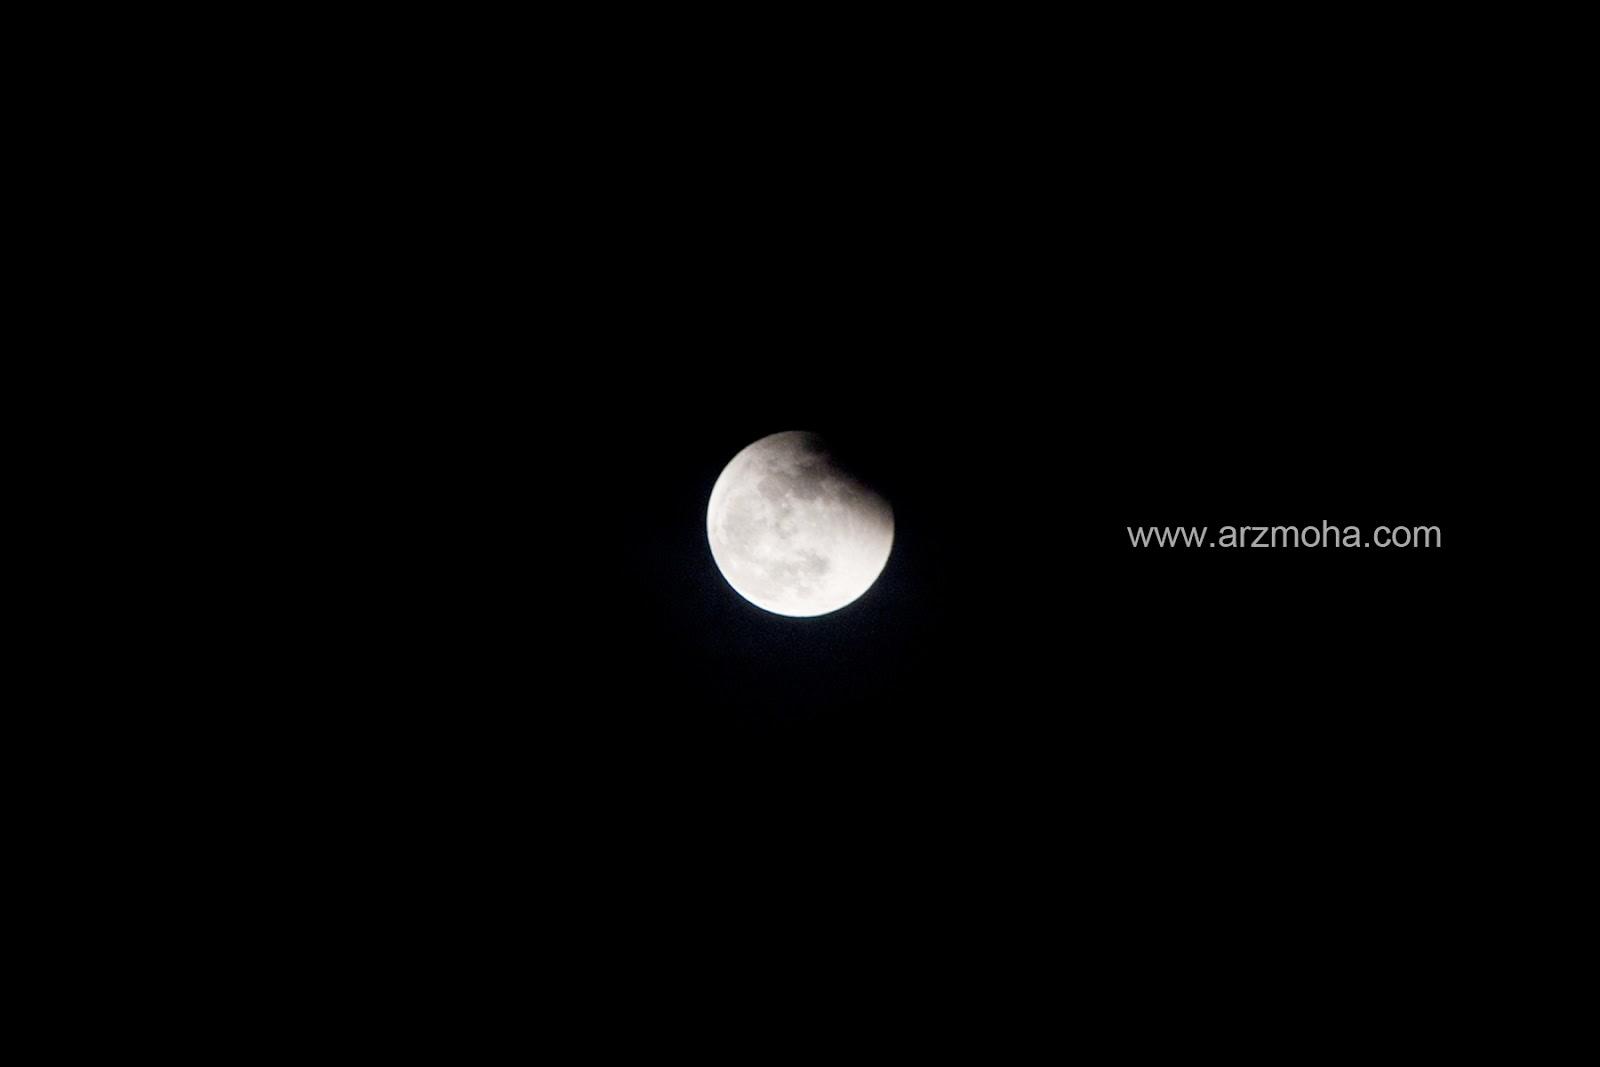 Gerhana Bulan, Eclipse, 8 oktober, 2014, arzmohdhaniffa photography